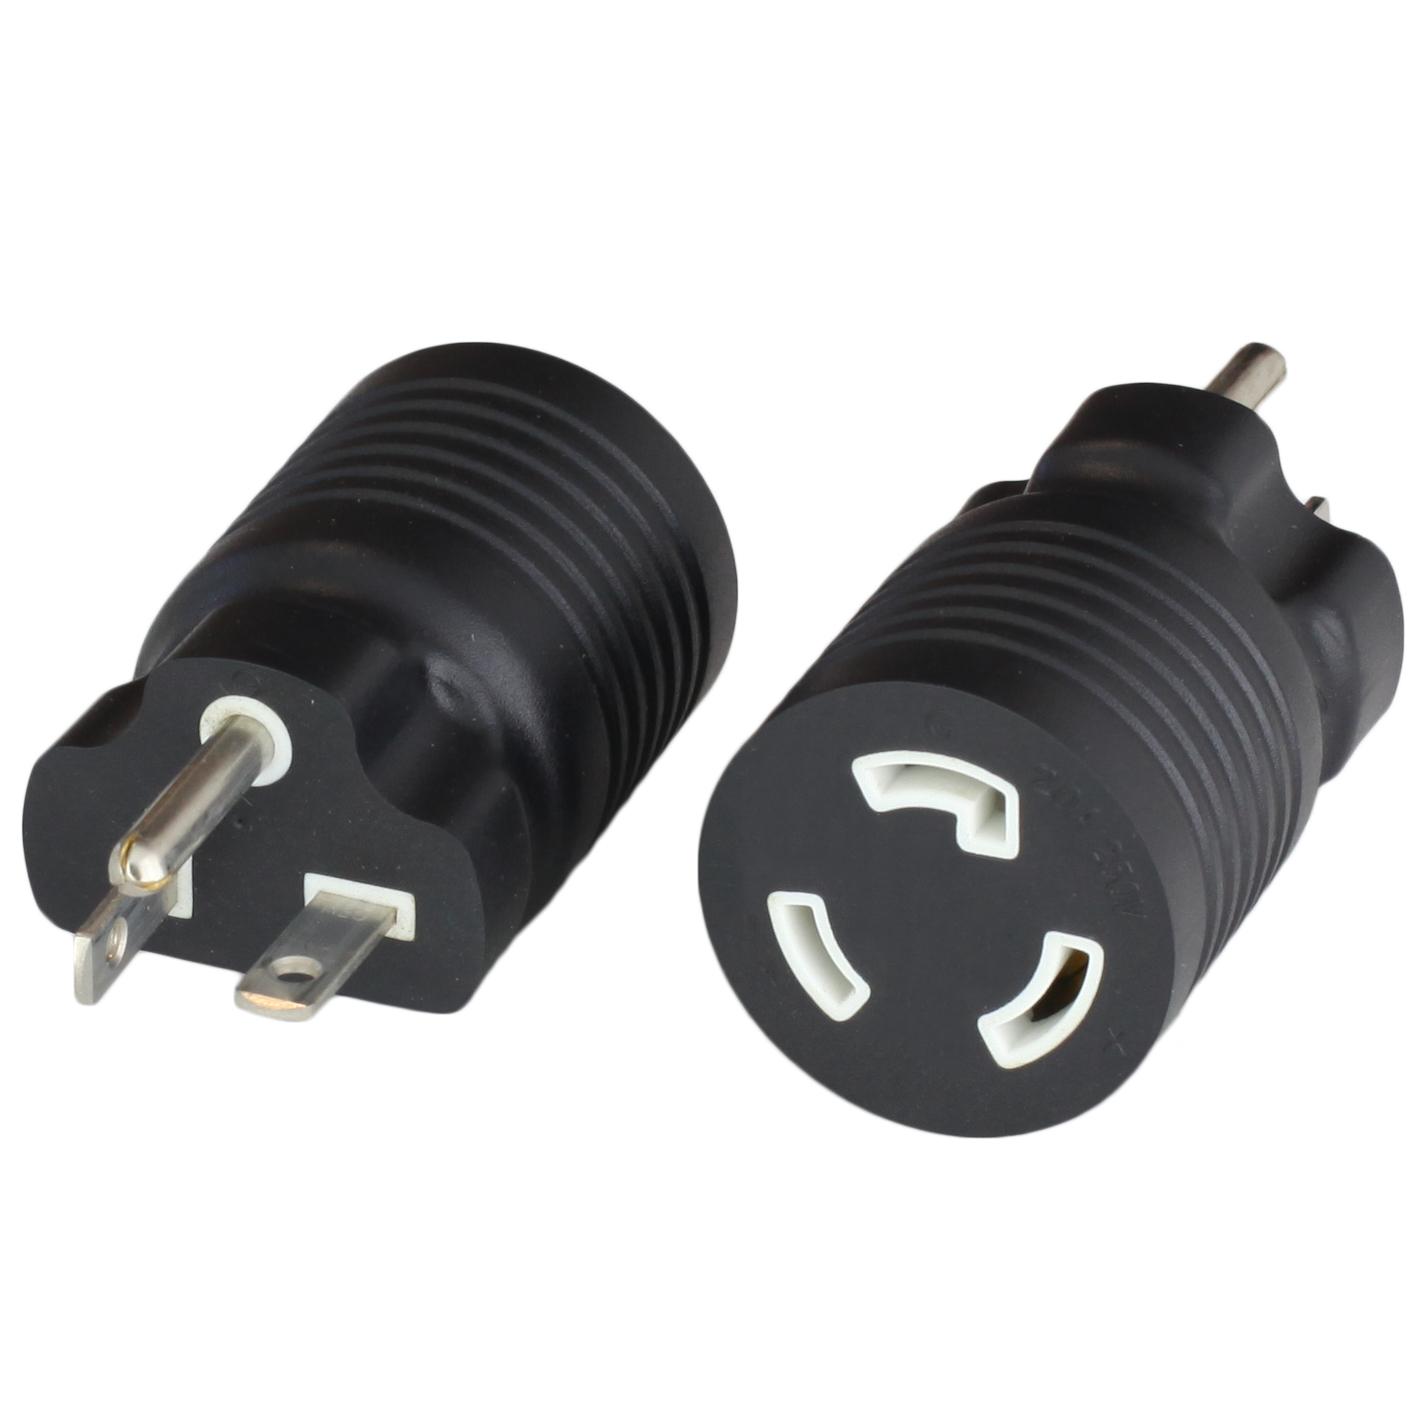 Adapter NEMA 6-20P to L6-20R 20A 250V BLACK